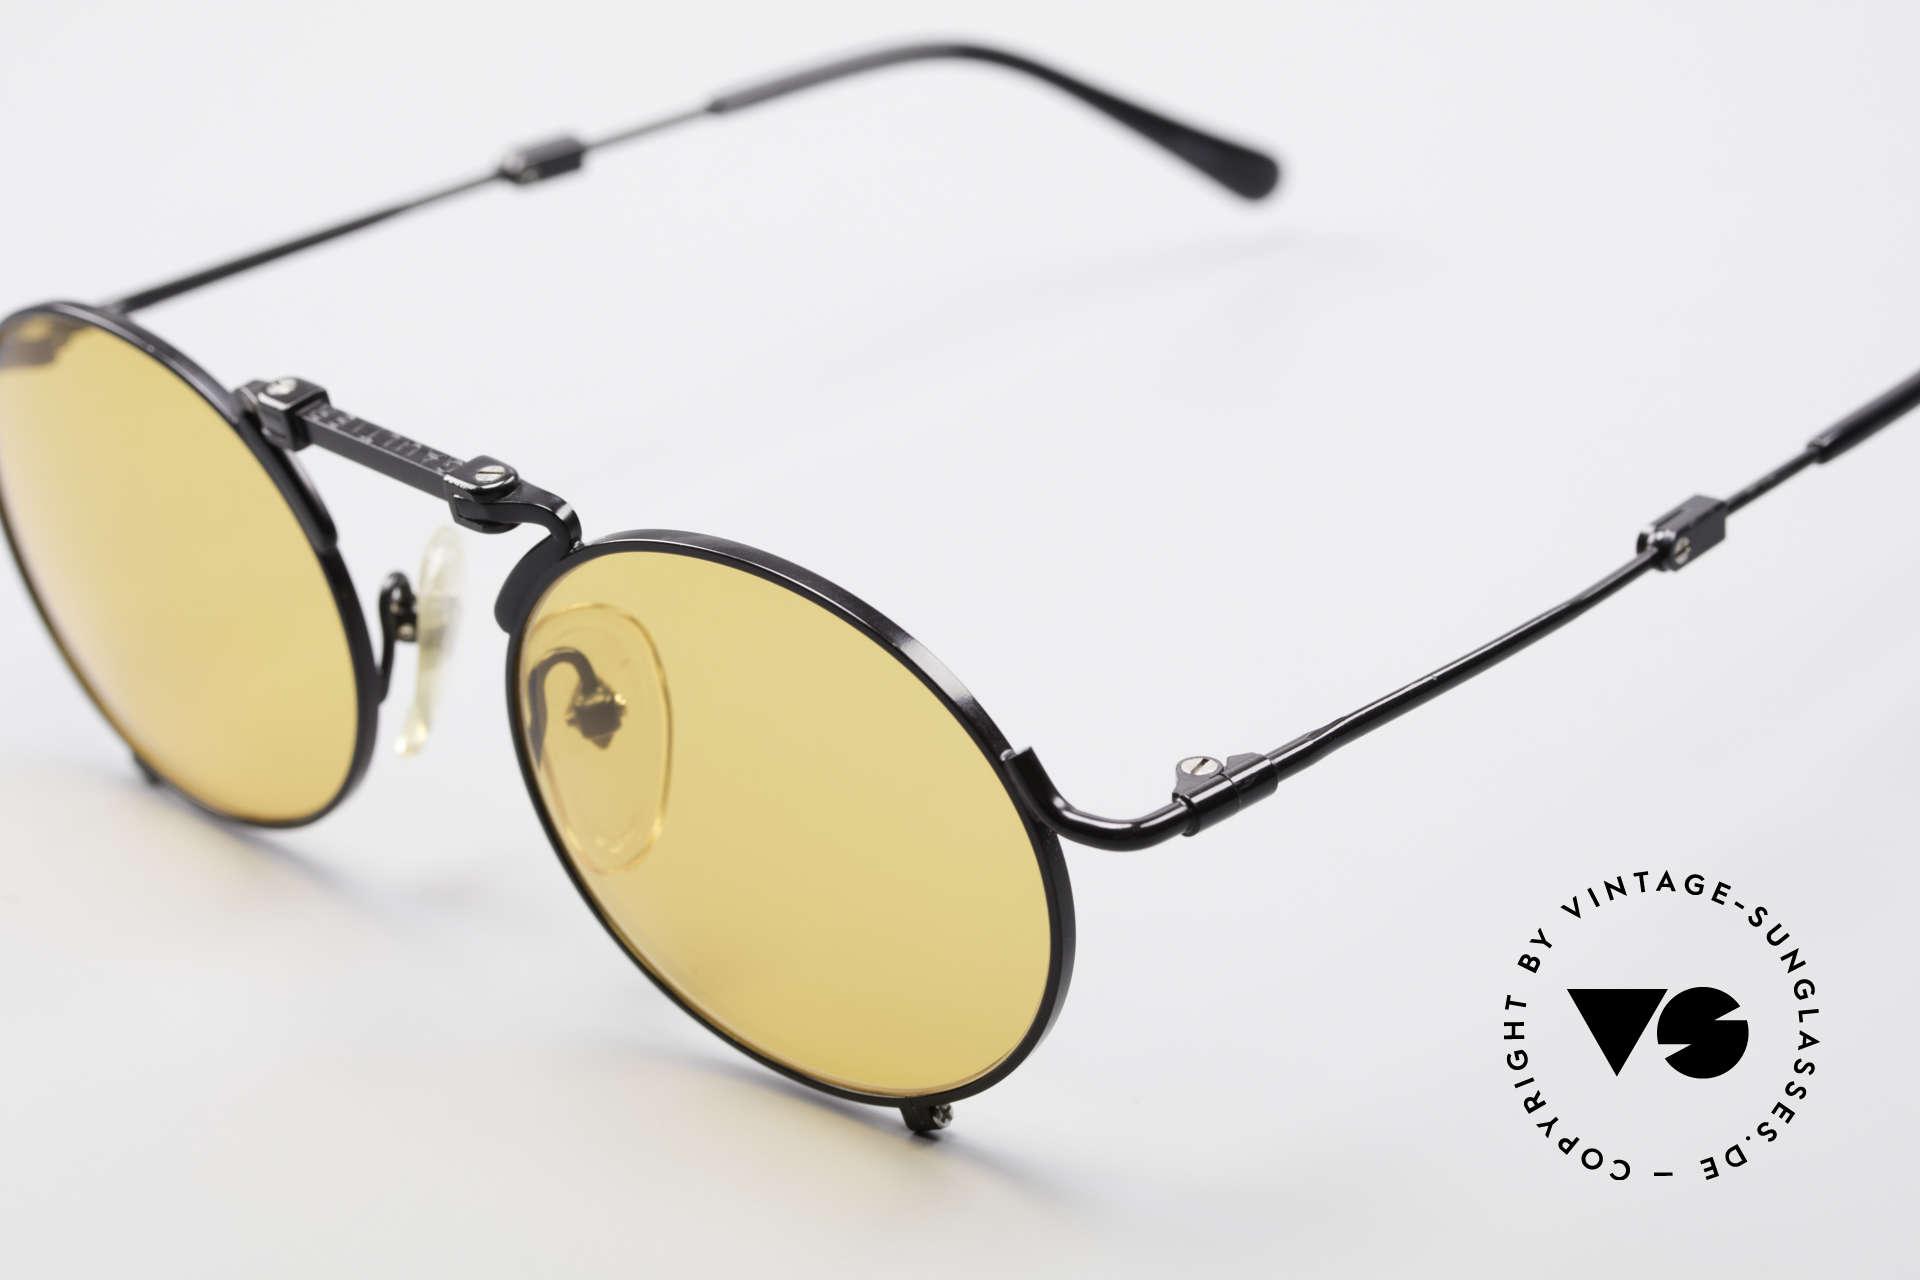 Jean Paul Gaultier 56-9171 90's Vintage Folding Sunglasses, black frame with ORANGE sun lenses (100% UV), Made for Men and Women